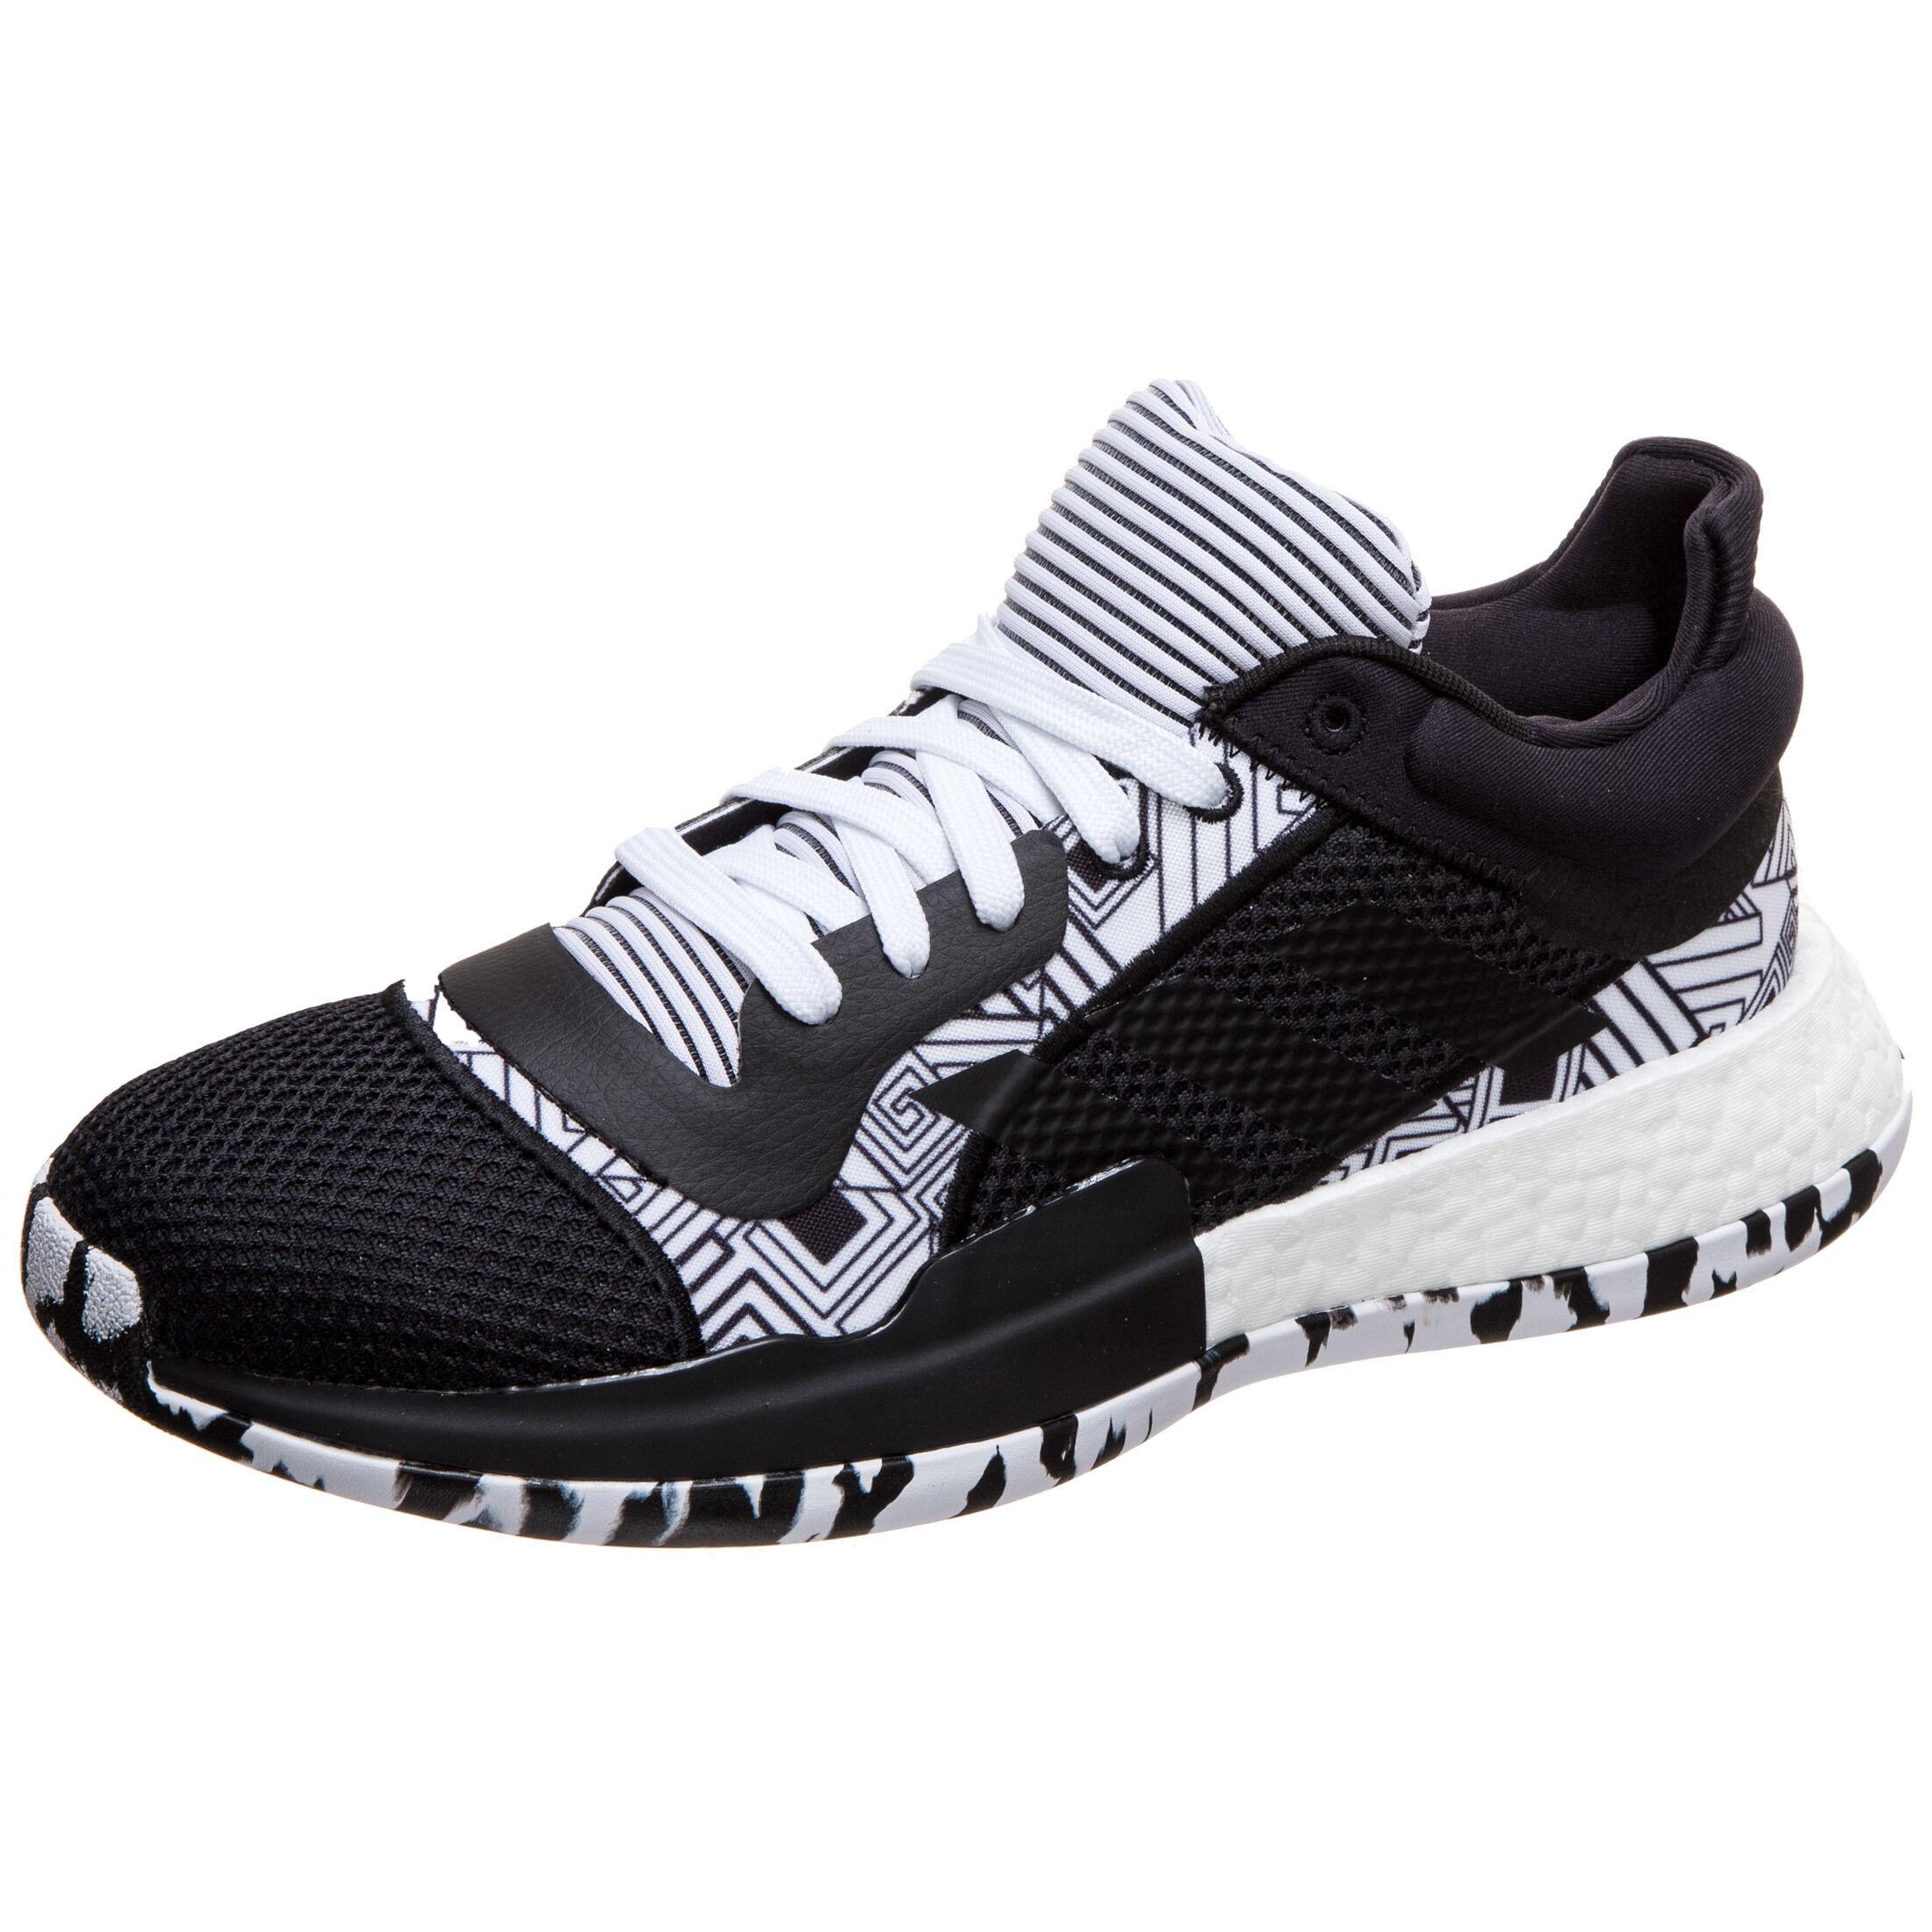 MARQUEE BOOST LOW Adidas, schwarz